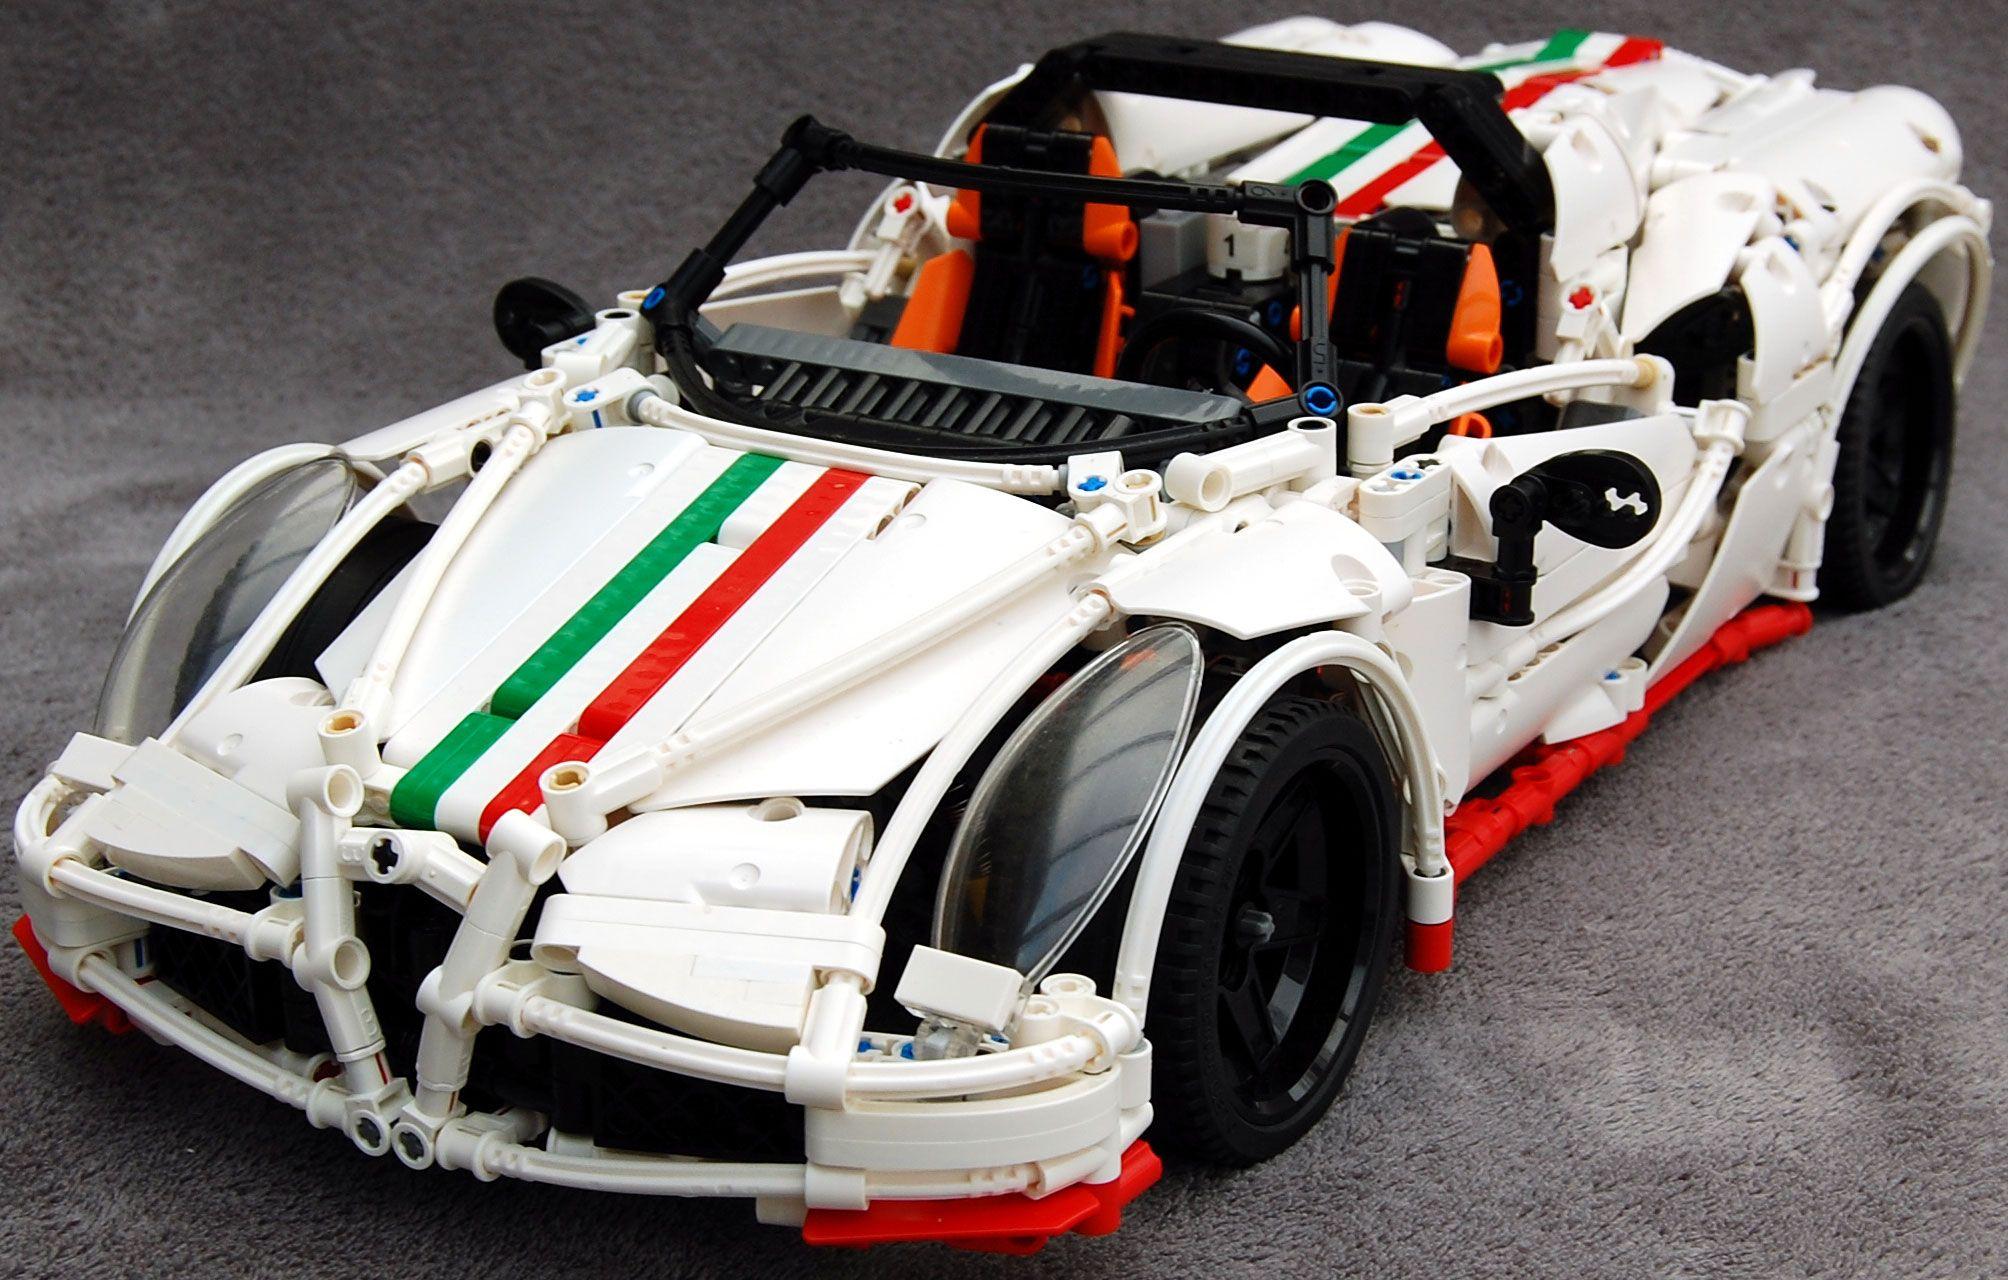 9ef1de056b858b5b8276623a28f8aad1 Remarkable 75912 Porsche 911 Gt Ziellinie Cars Trend